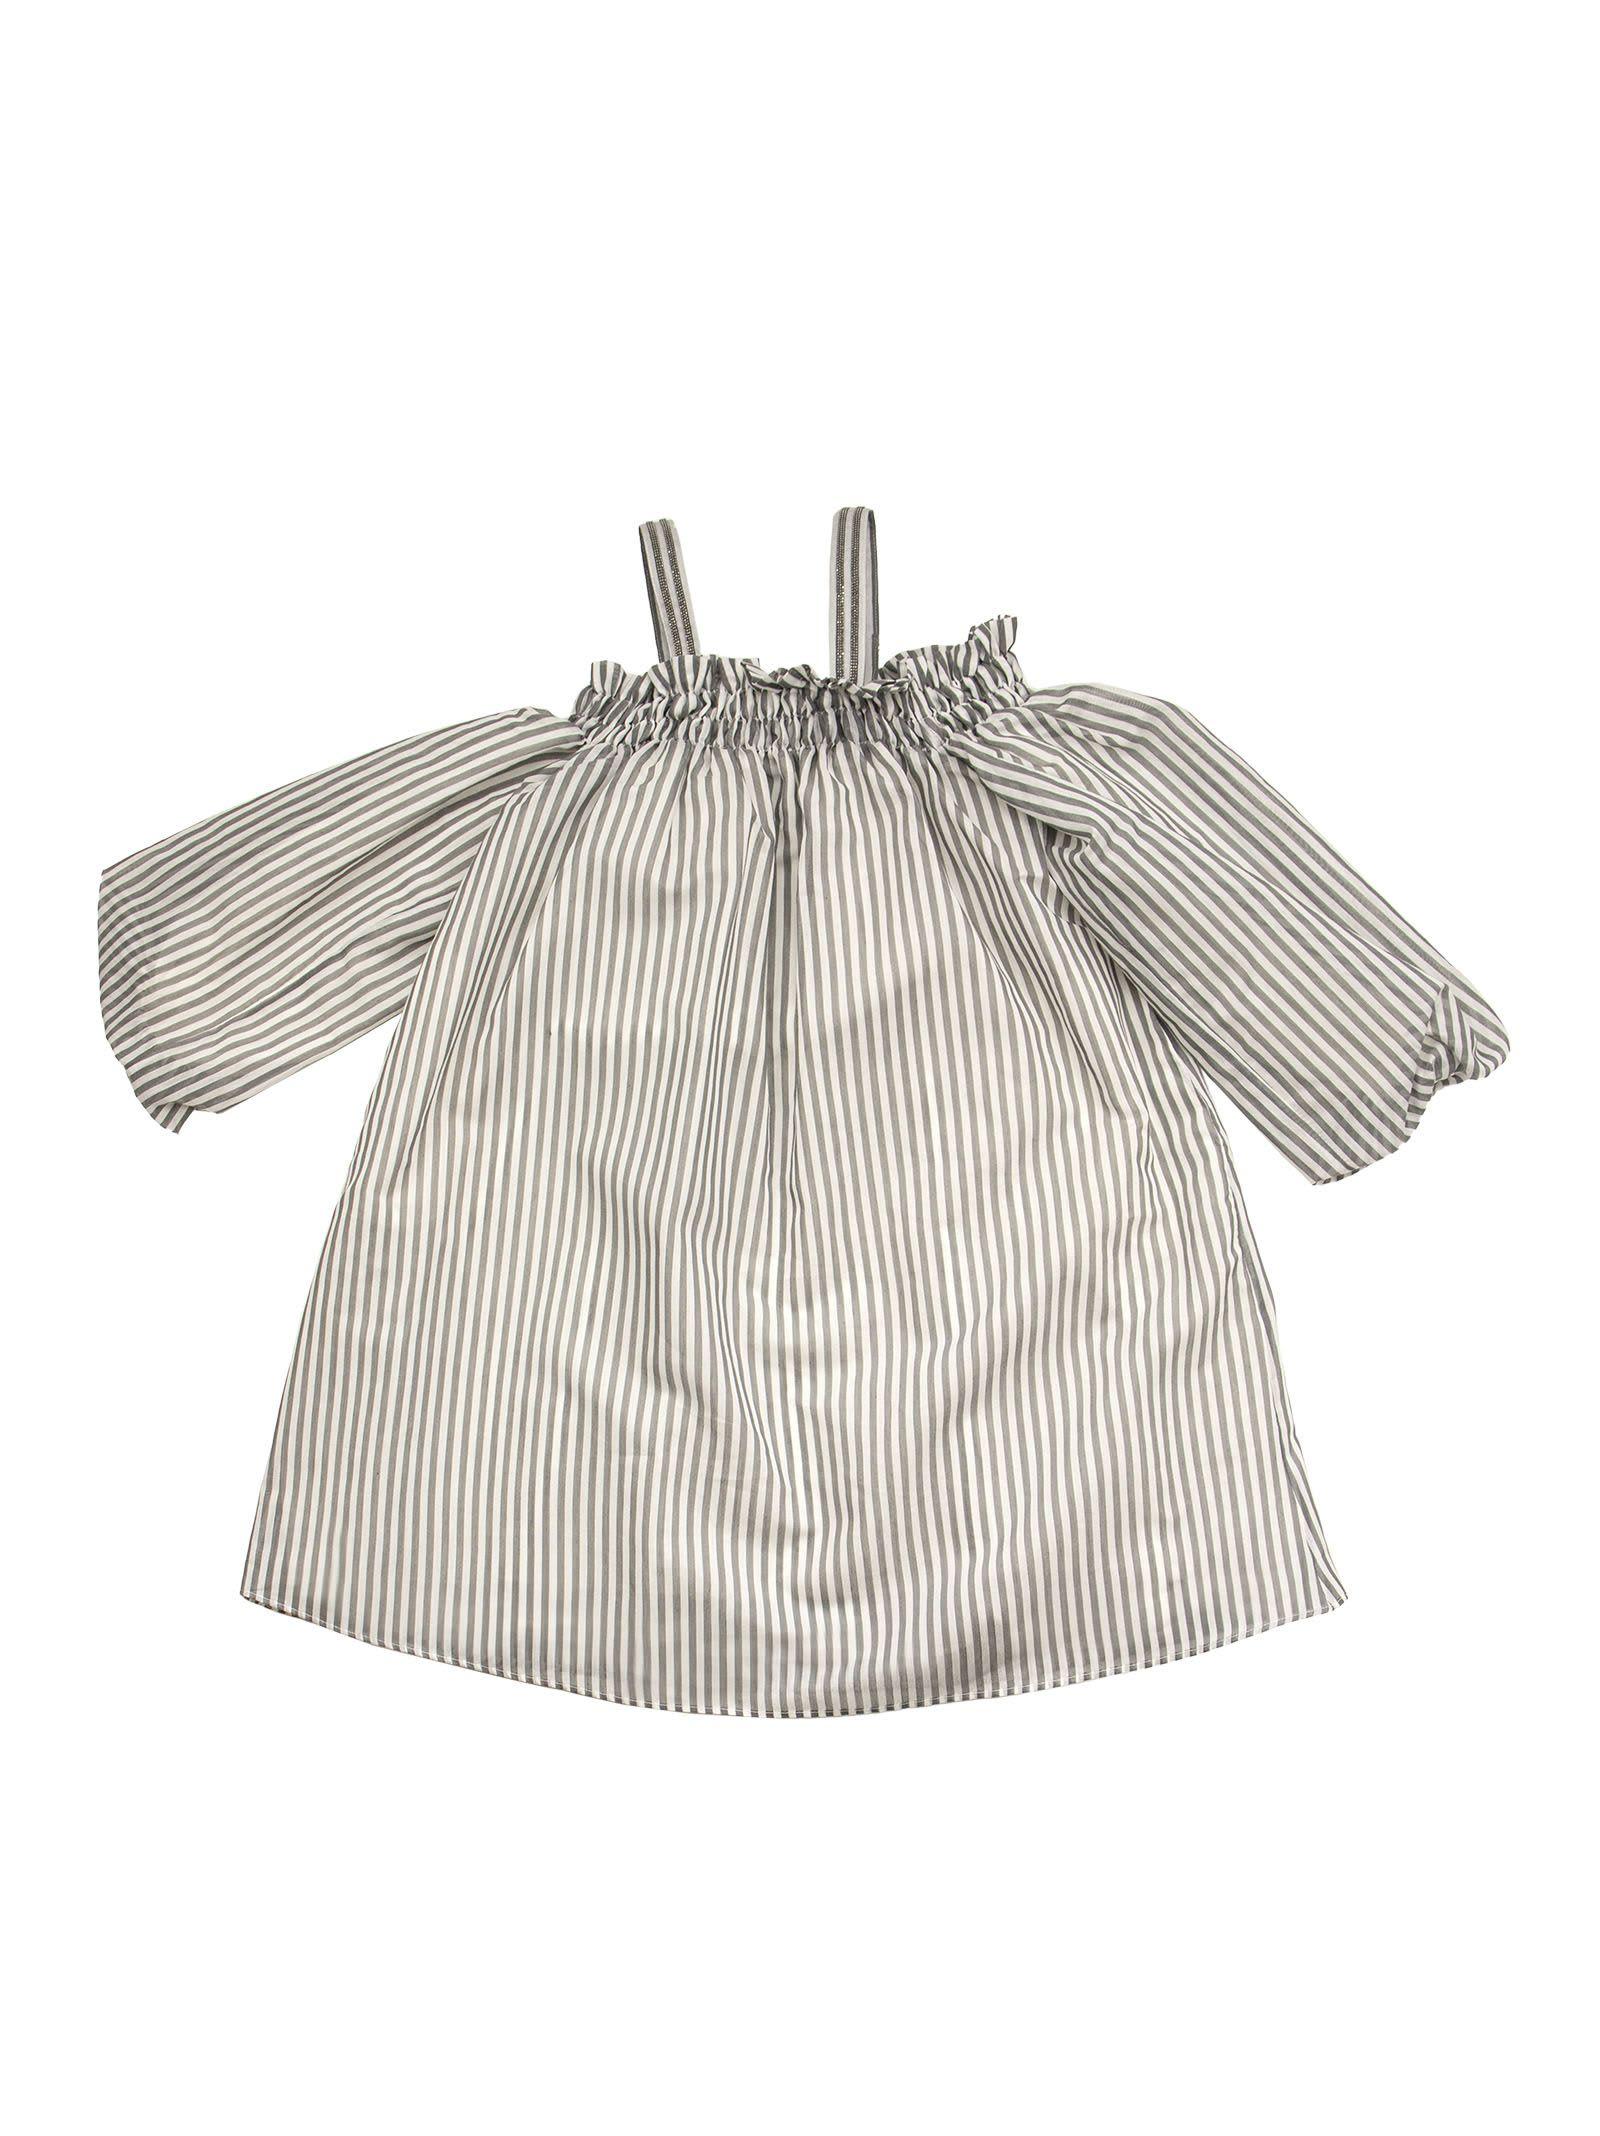 Brunello Cucinelli Off-the-shoulder Dress In Striped Cotton Poplin With Monili